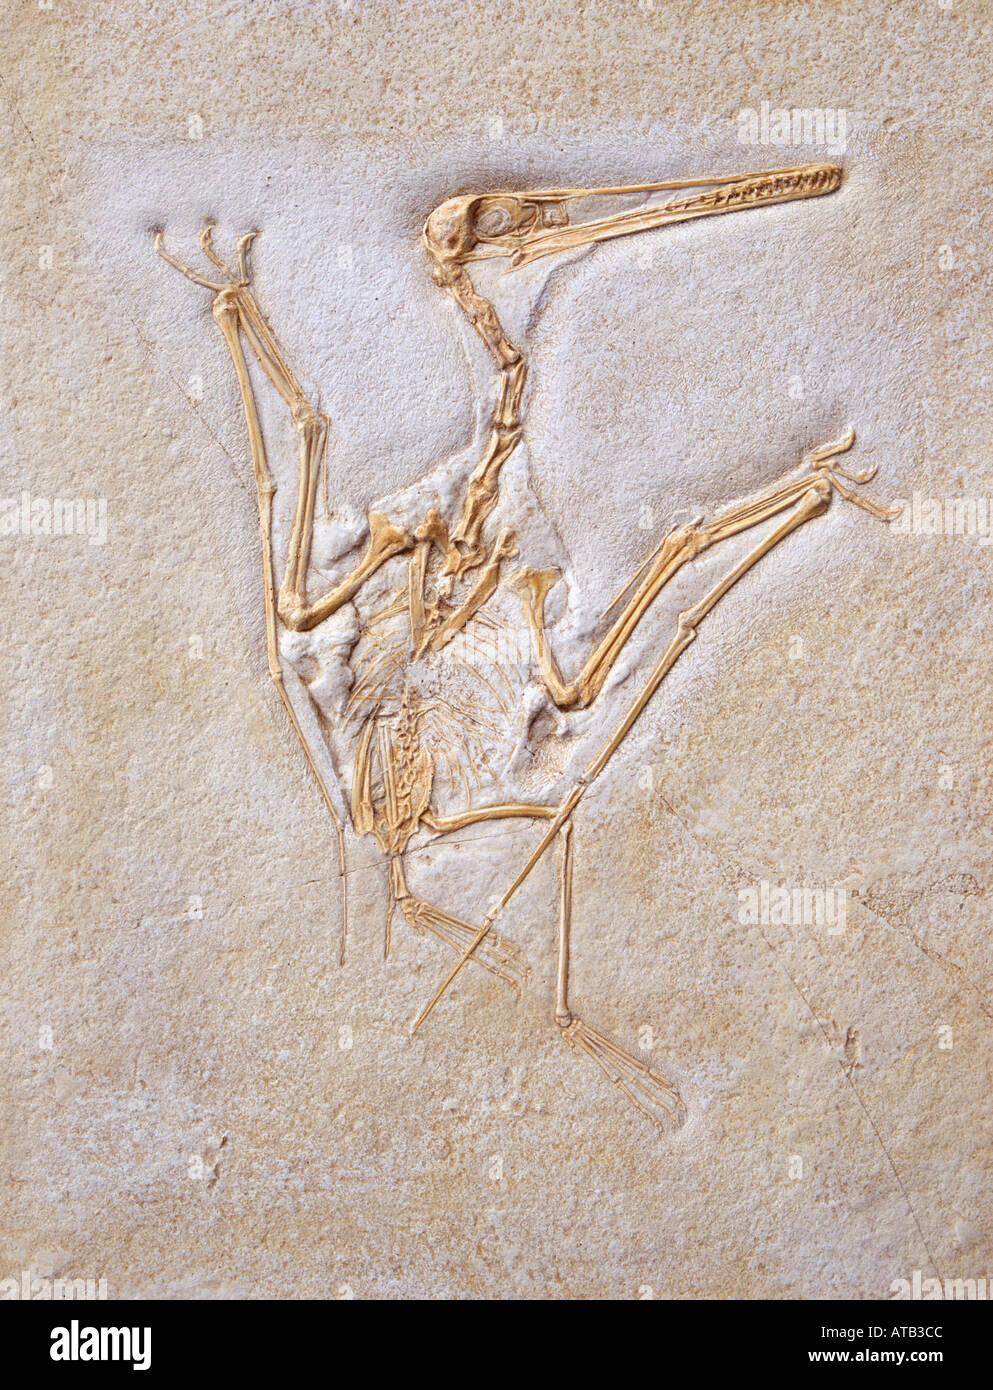 Pterodactylus kochi pterosaur fossil - Stock Image